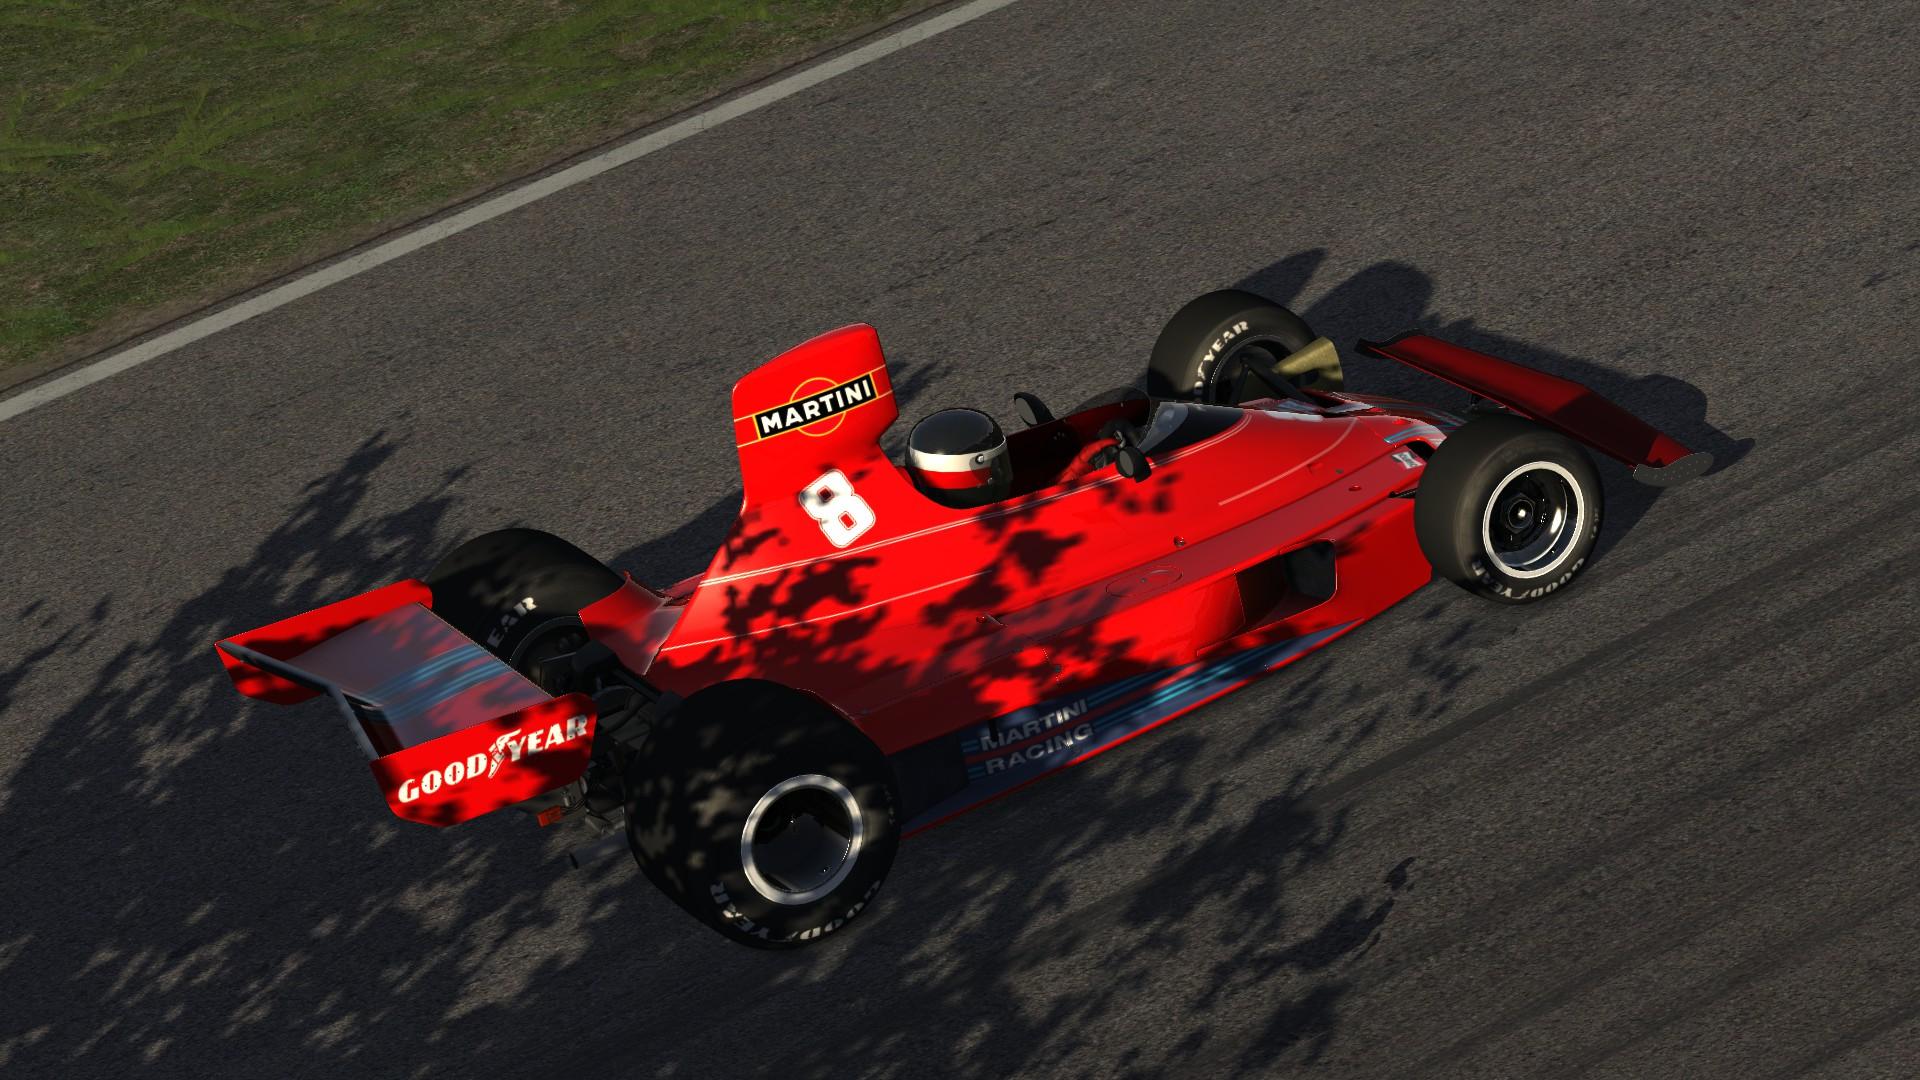 Brabham Martini